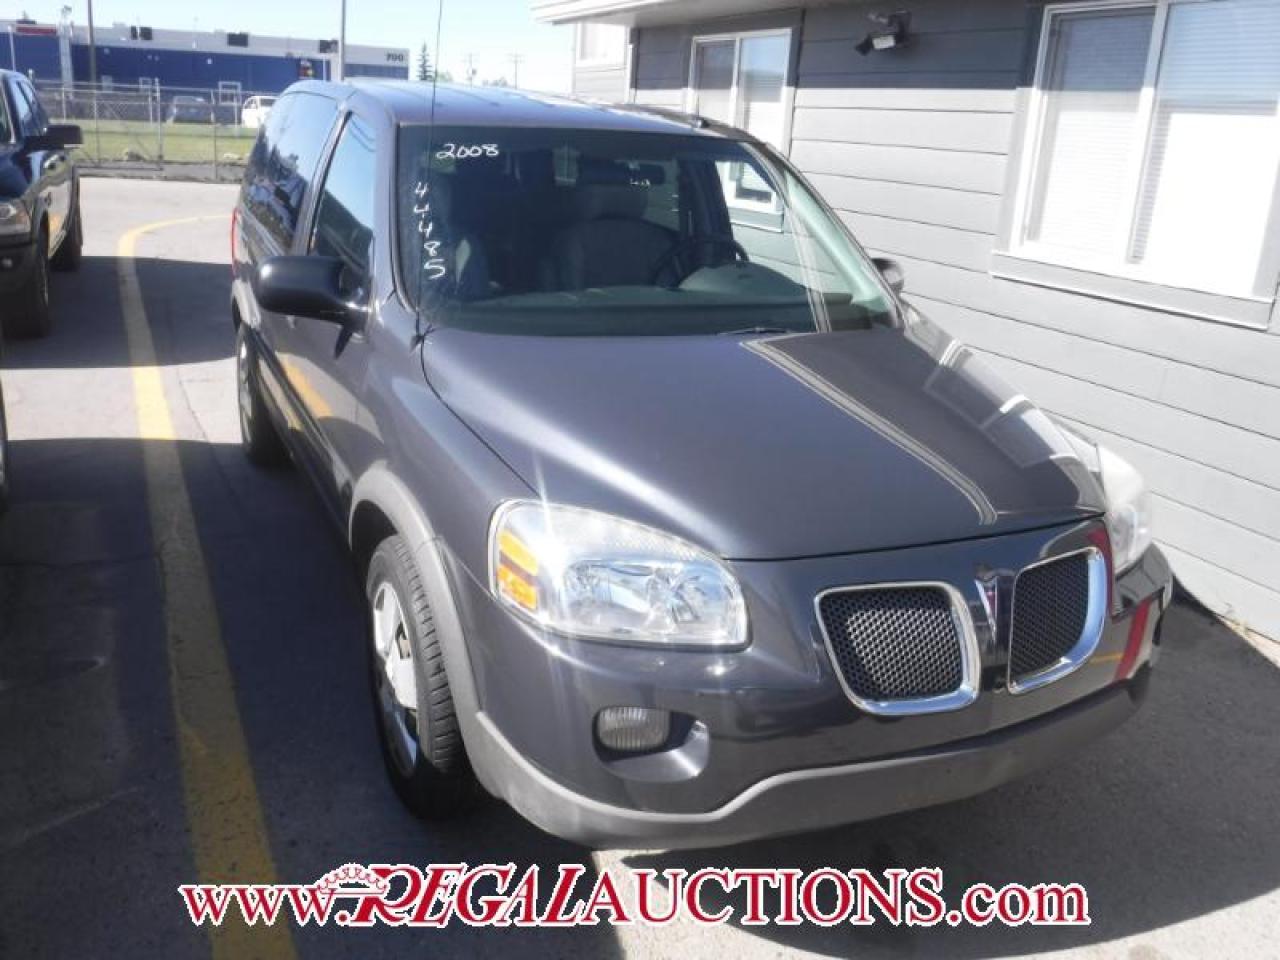 2008 Pontiac Montana 4D WAGON